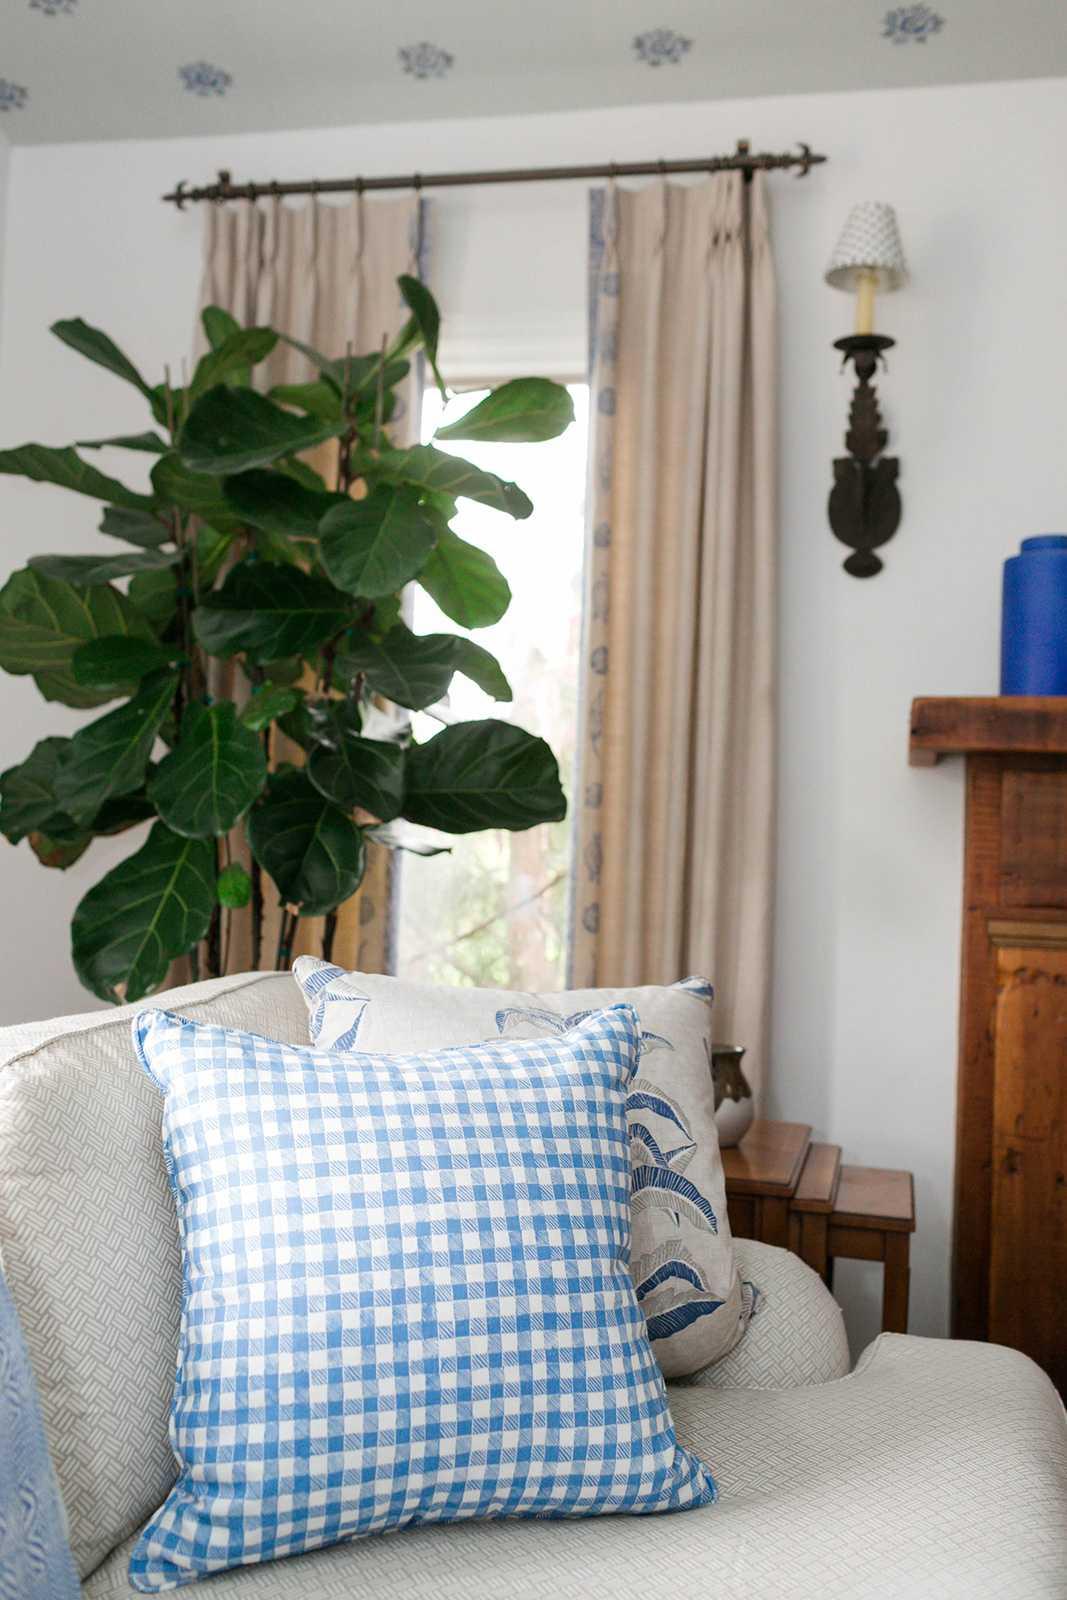 Block Print Gingham pillow in Blue, Photo by Karyn Millet